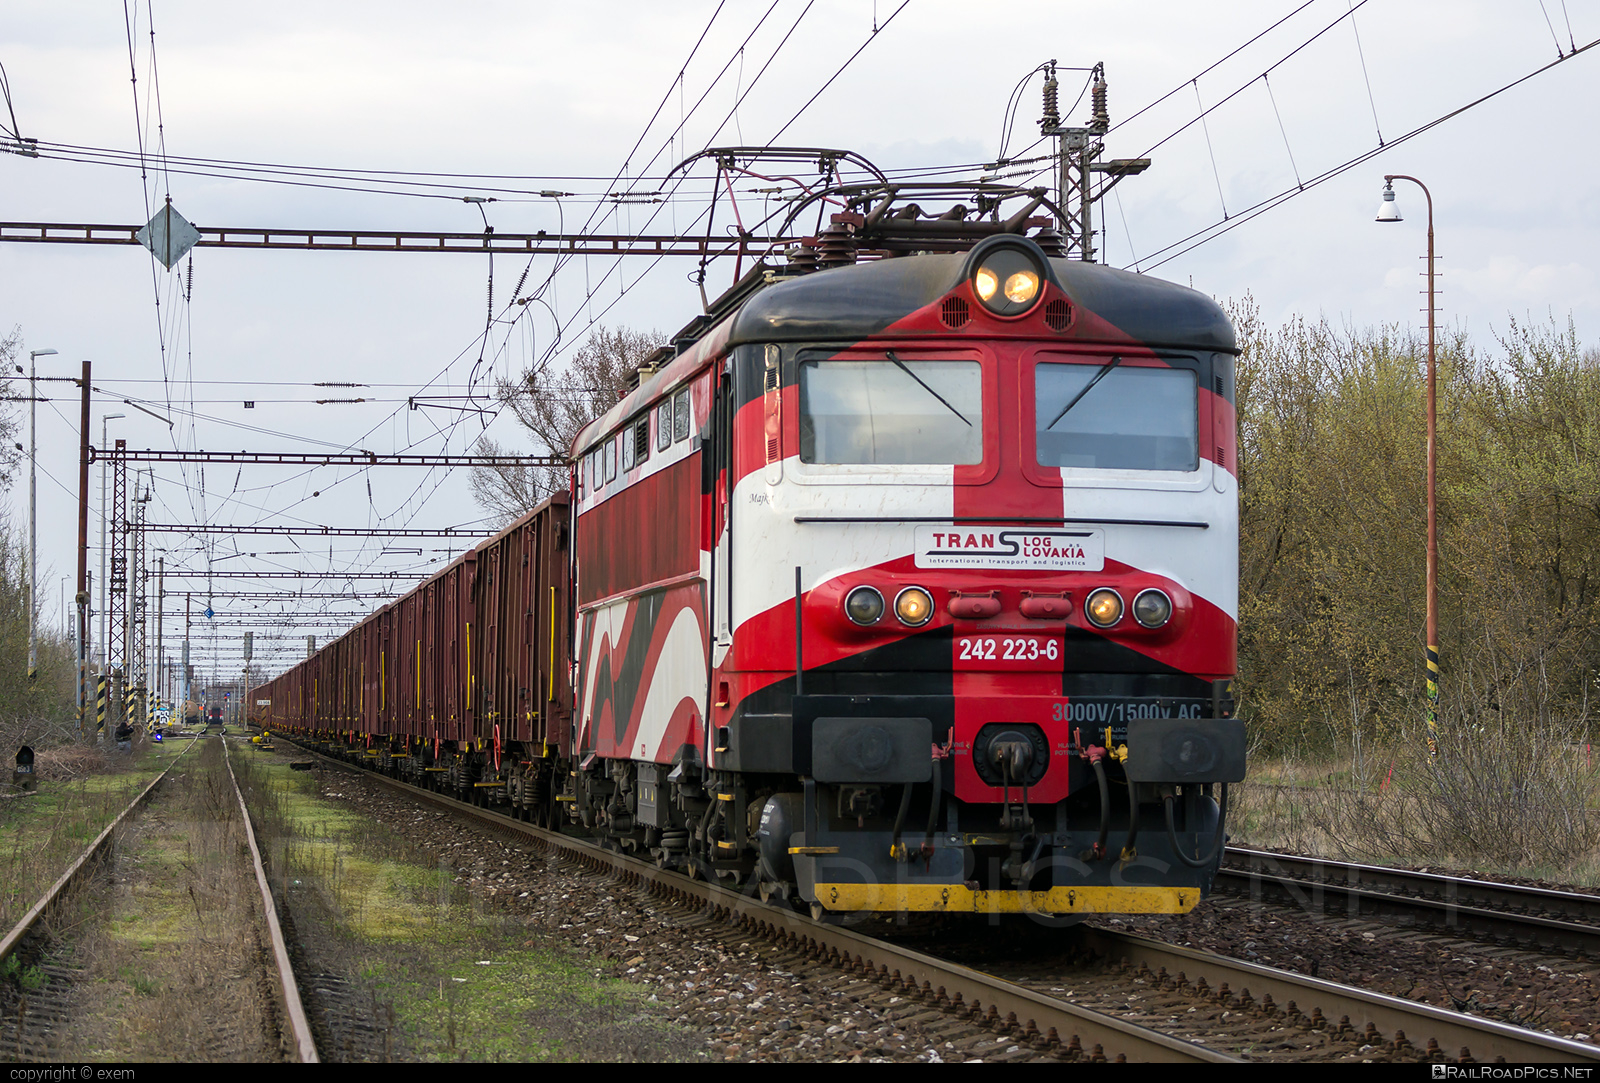 Škoda 73E - 242 223-6 operated by PETROLSPED Slovakia s.r.o. #locomotive242 #petrolsped #plechac #skoda #skoda73e #tlssk #translog #translogslovakia